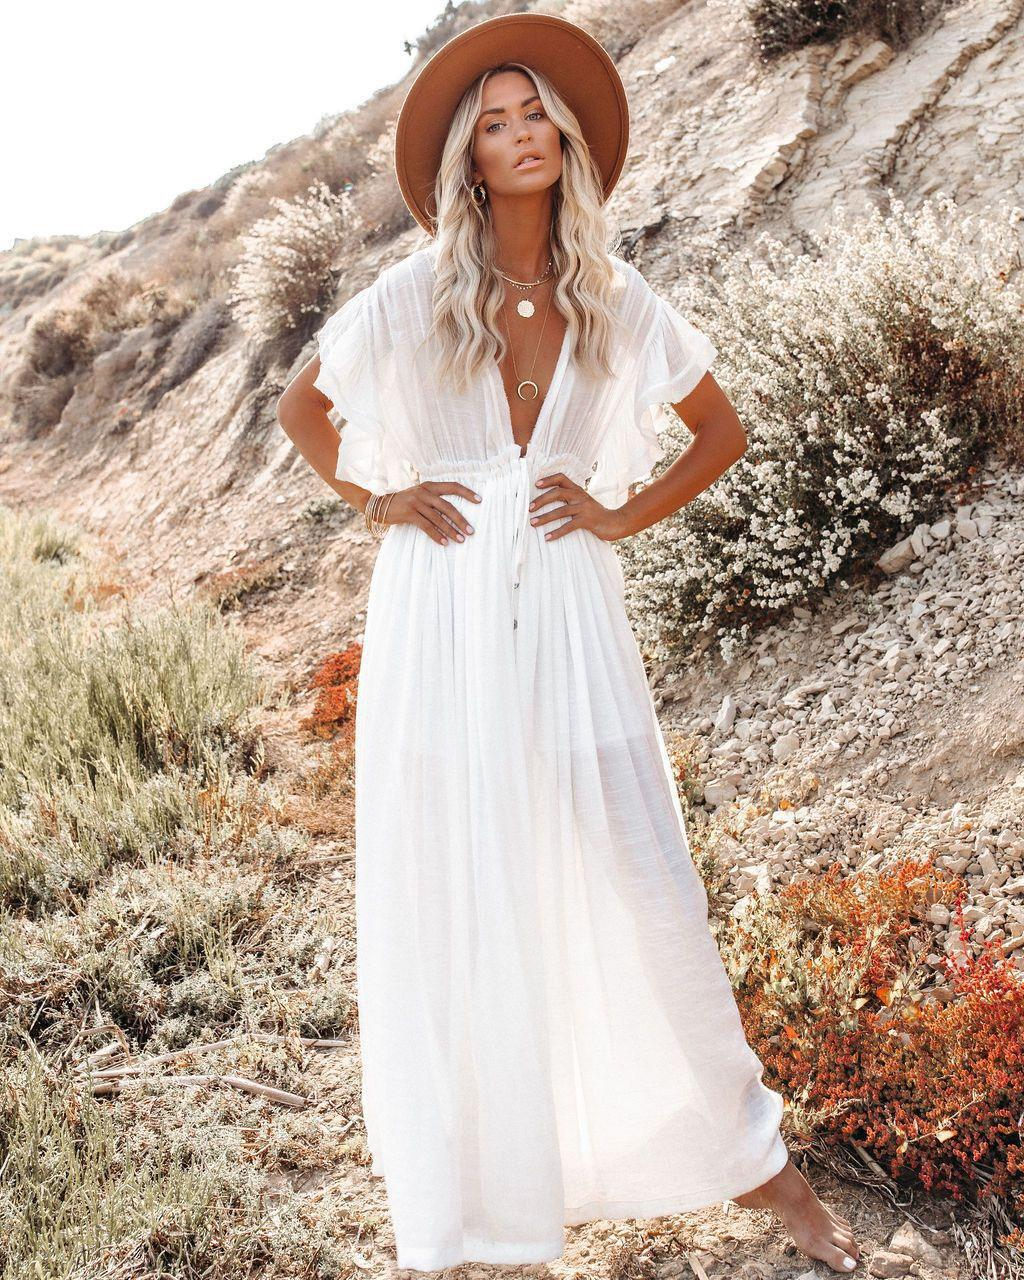 2021 Summer Retro Women Casual Dresses Beach dress blouse Button Drawstring Sun protection shirt V-Neck One size